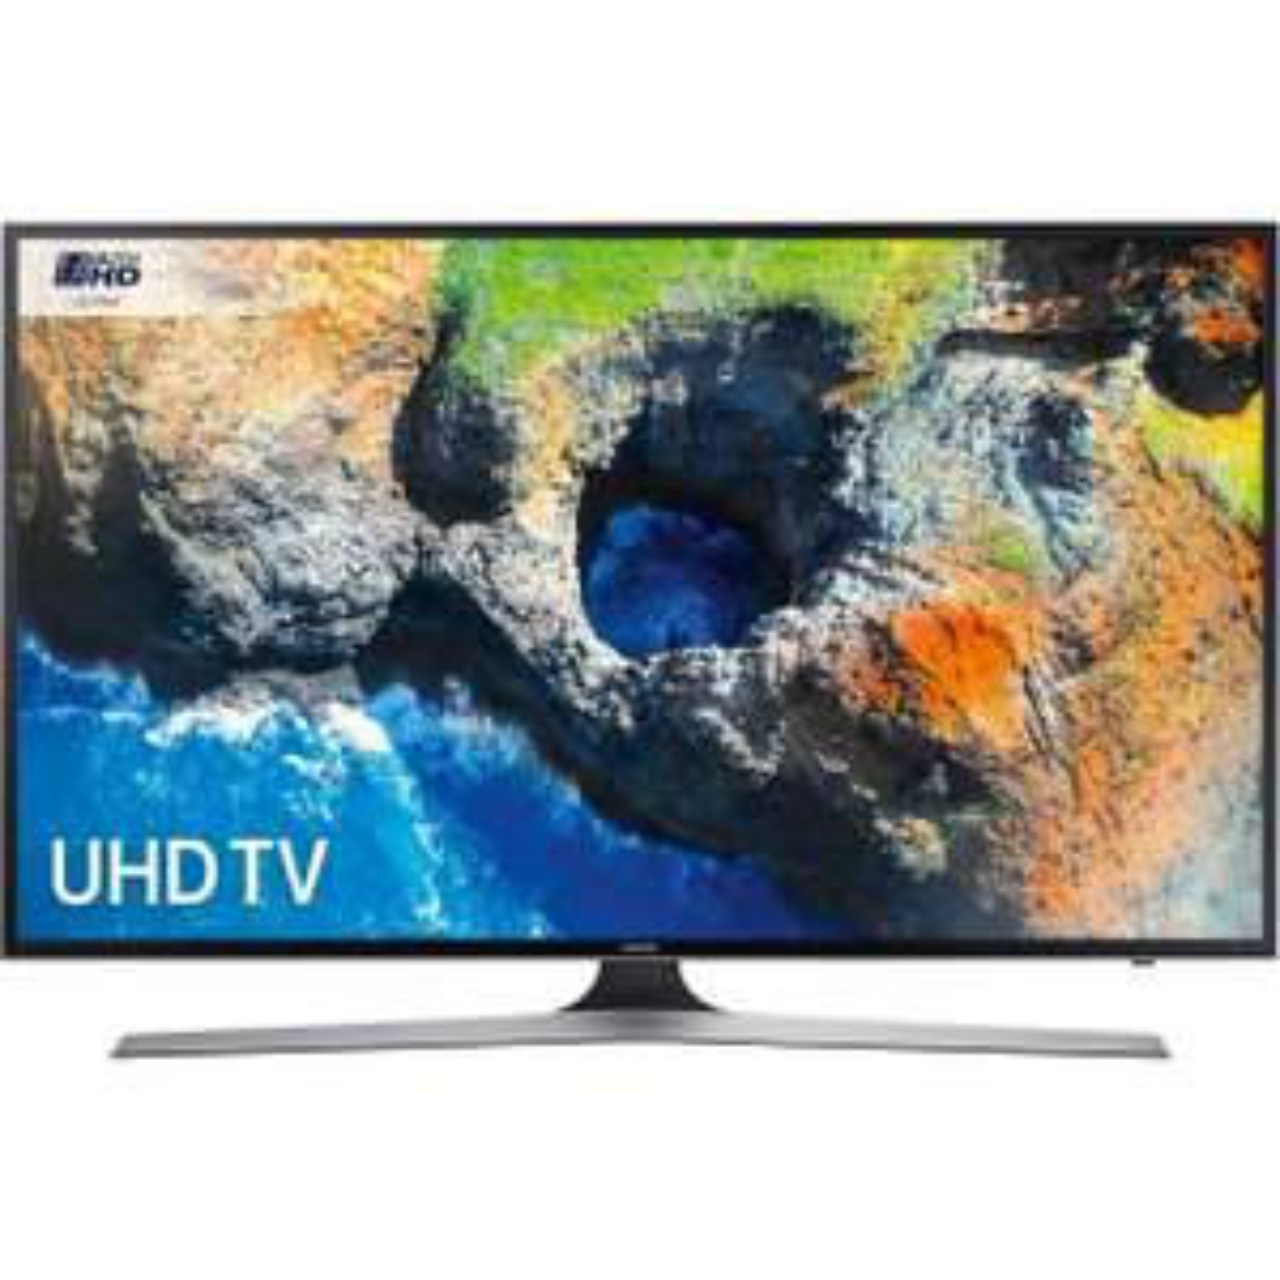 "Samsung UE50MU6120 50"" Smart 4K Ultra HD with HDR TV - Black £389 w/code @ AO"